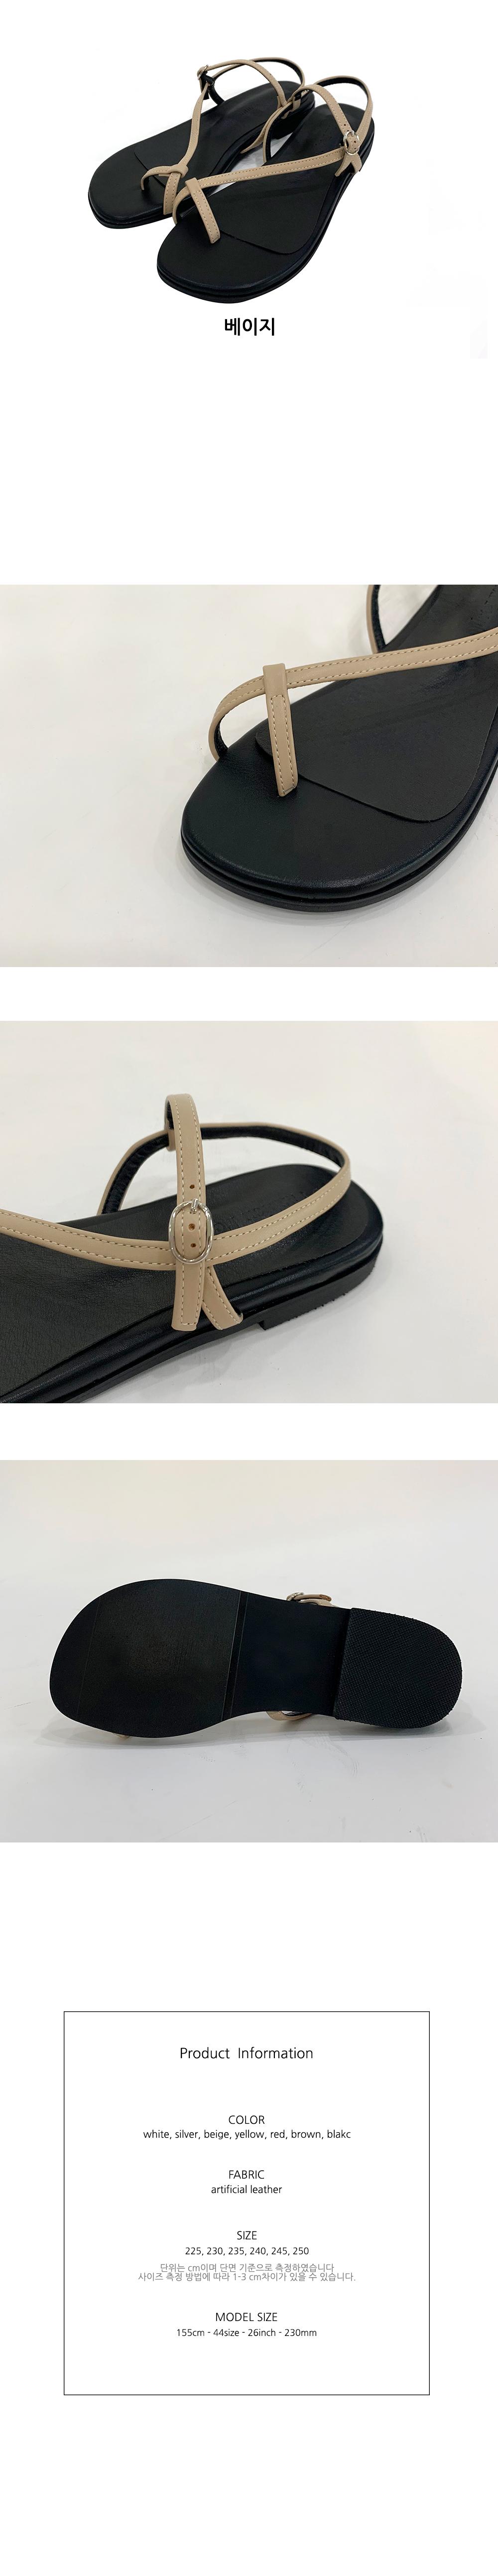 Thumb strap sandals S#YW301